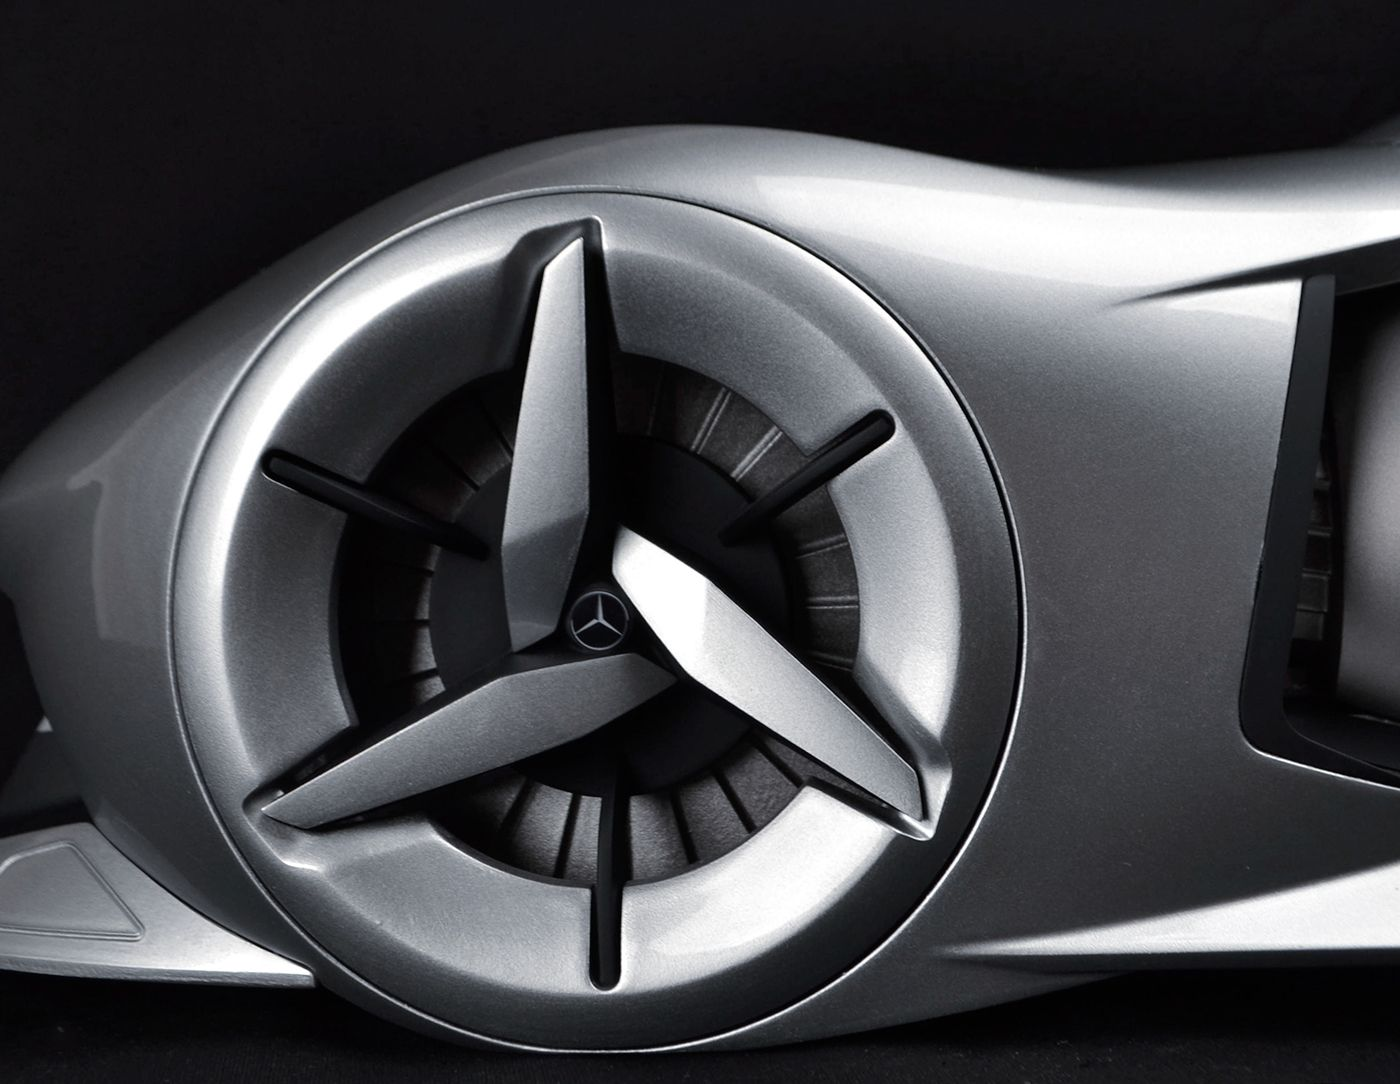 211 best wheels images on pinterest | car wheels, automotive